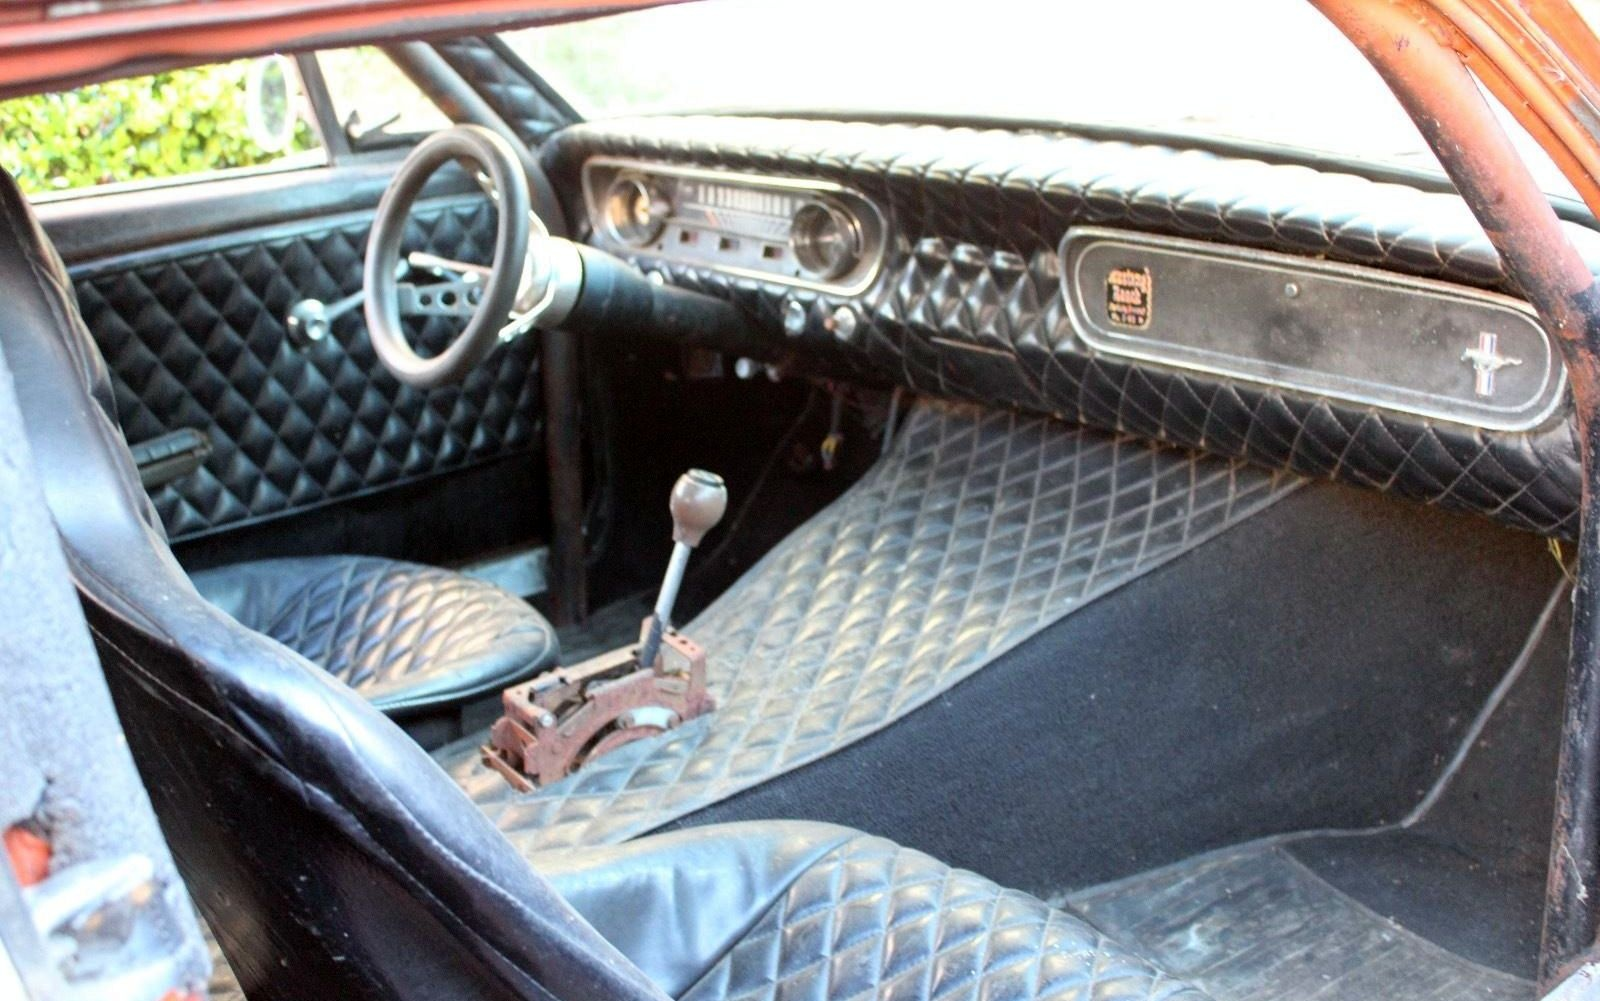 70 39 s street racer 1965 ford mustang. Black Bedroom Furniture Sets. Home Design Ideas